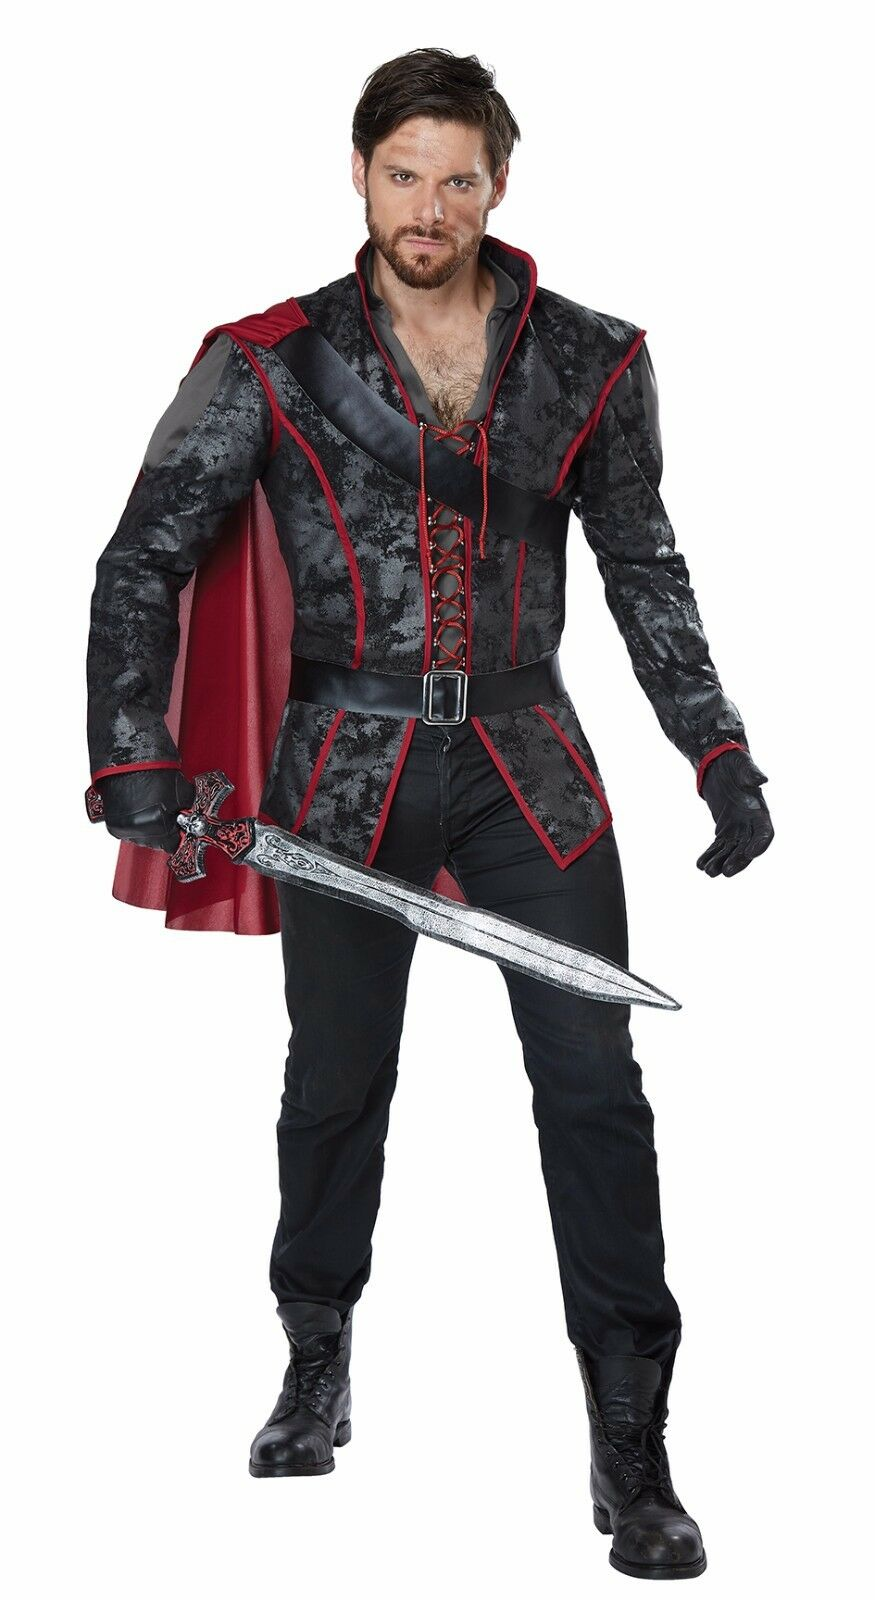 Disney Snow White Storybook Huntsman Prince Knight Adult Costume Ebay